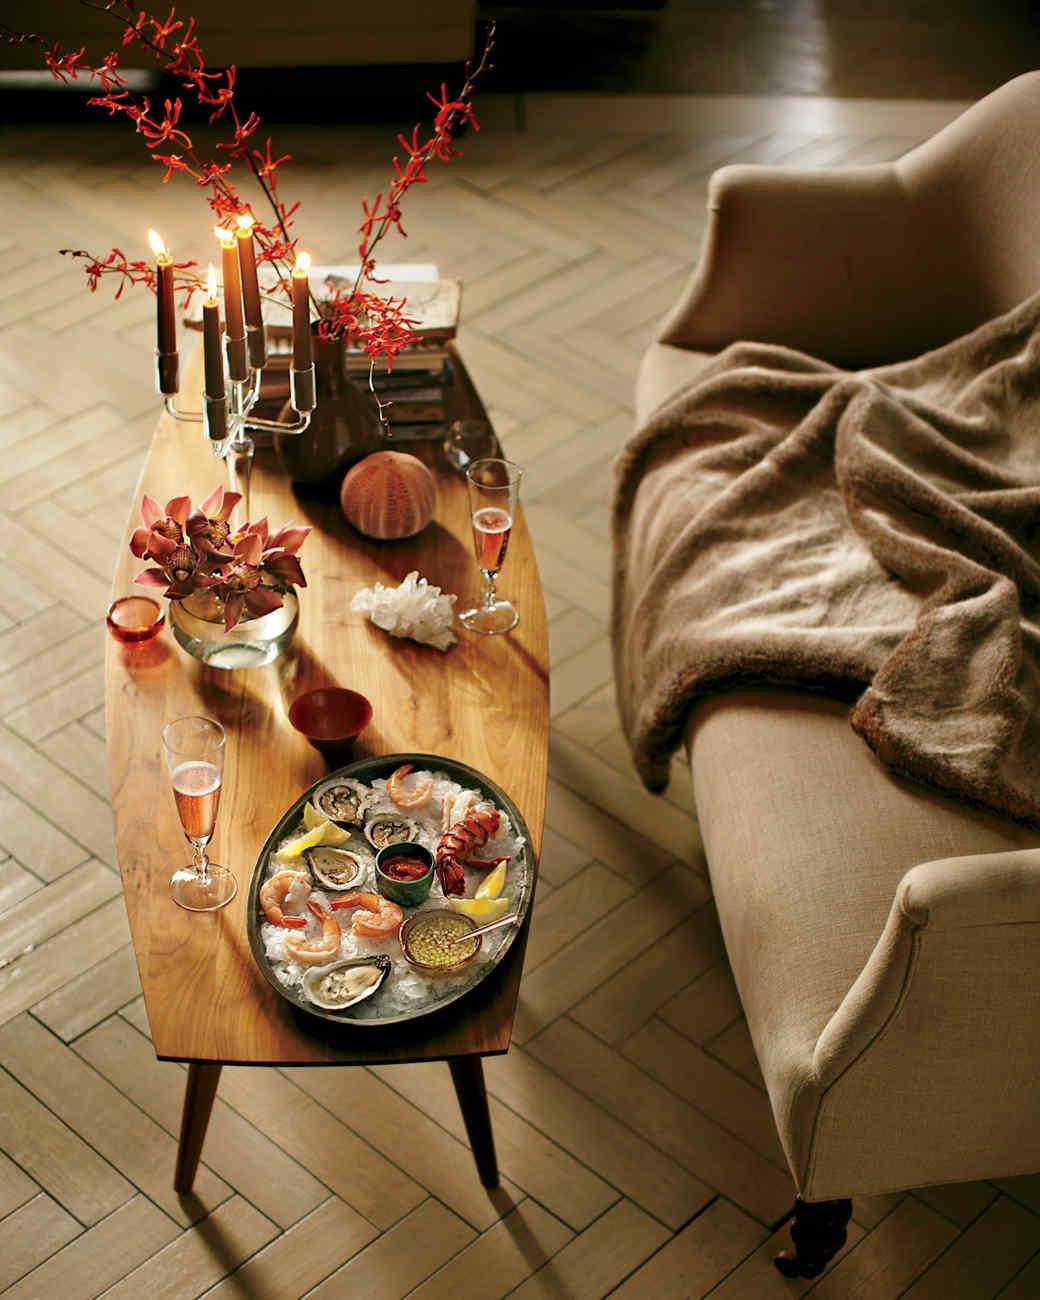 coffee-table-mld108084.jpg